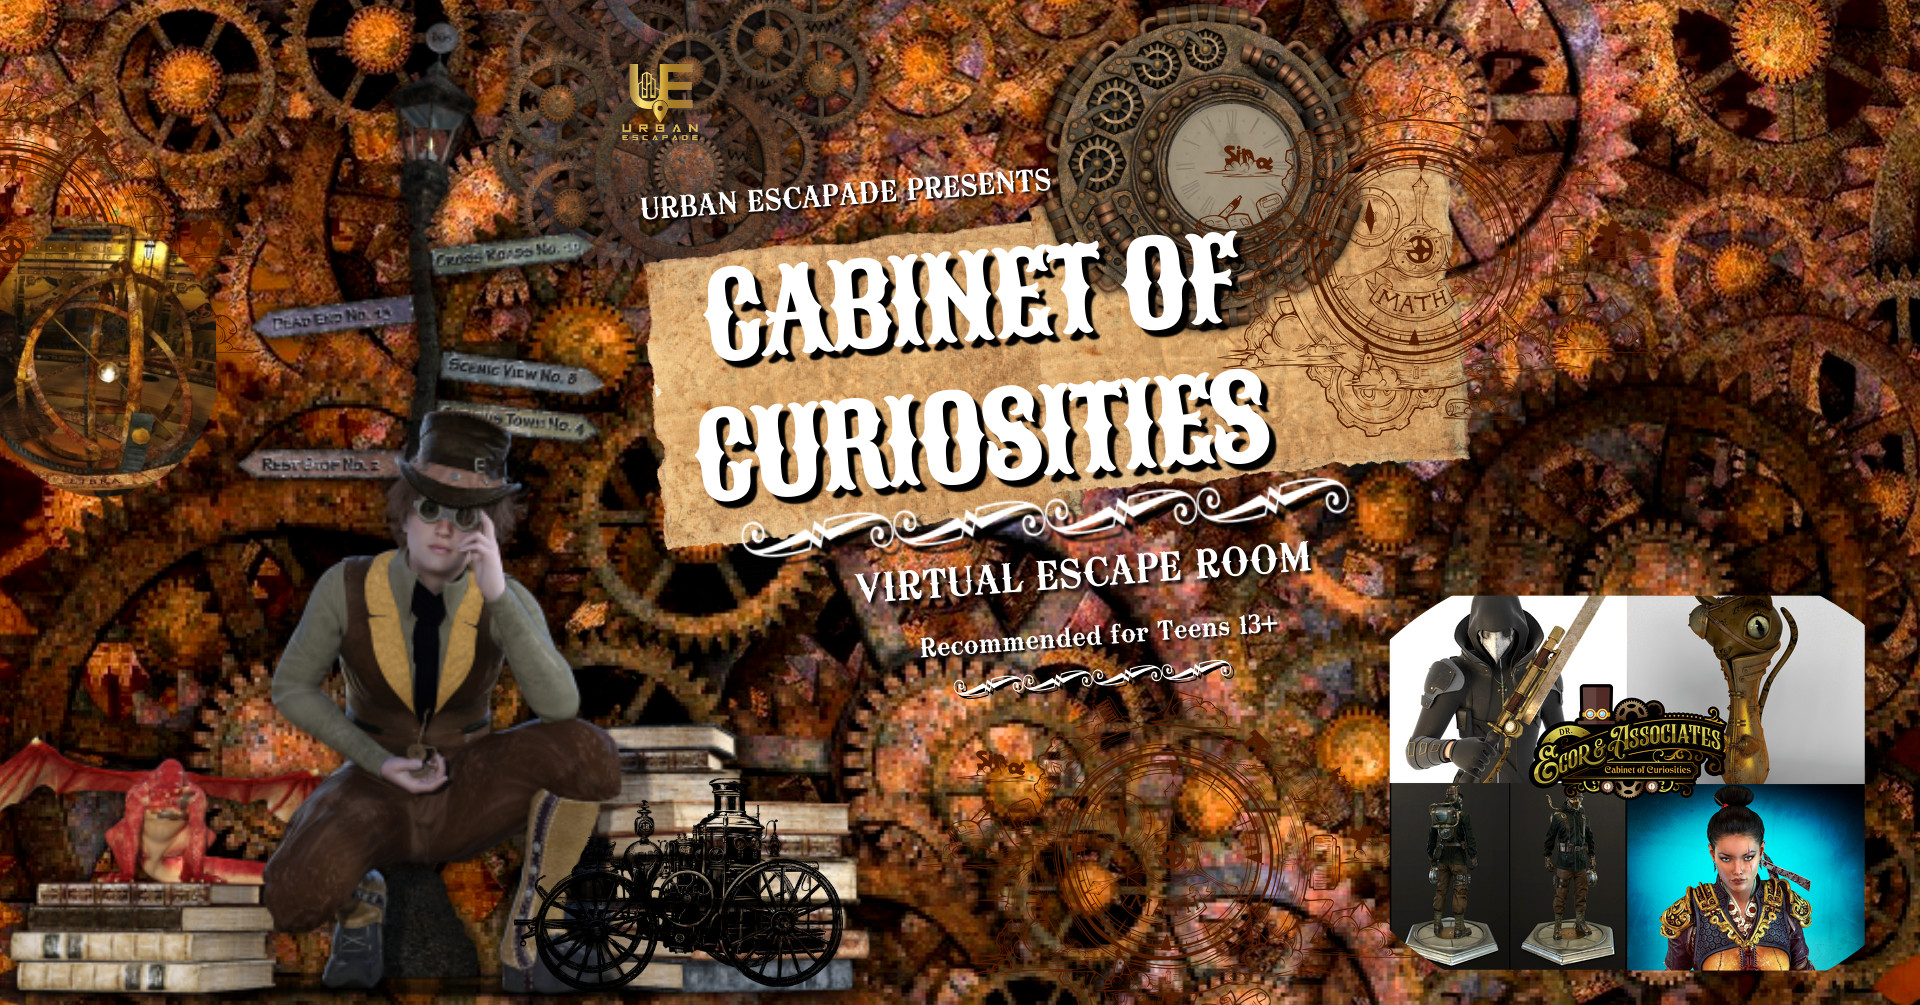 Cabinet of Curiosities Escape Room